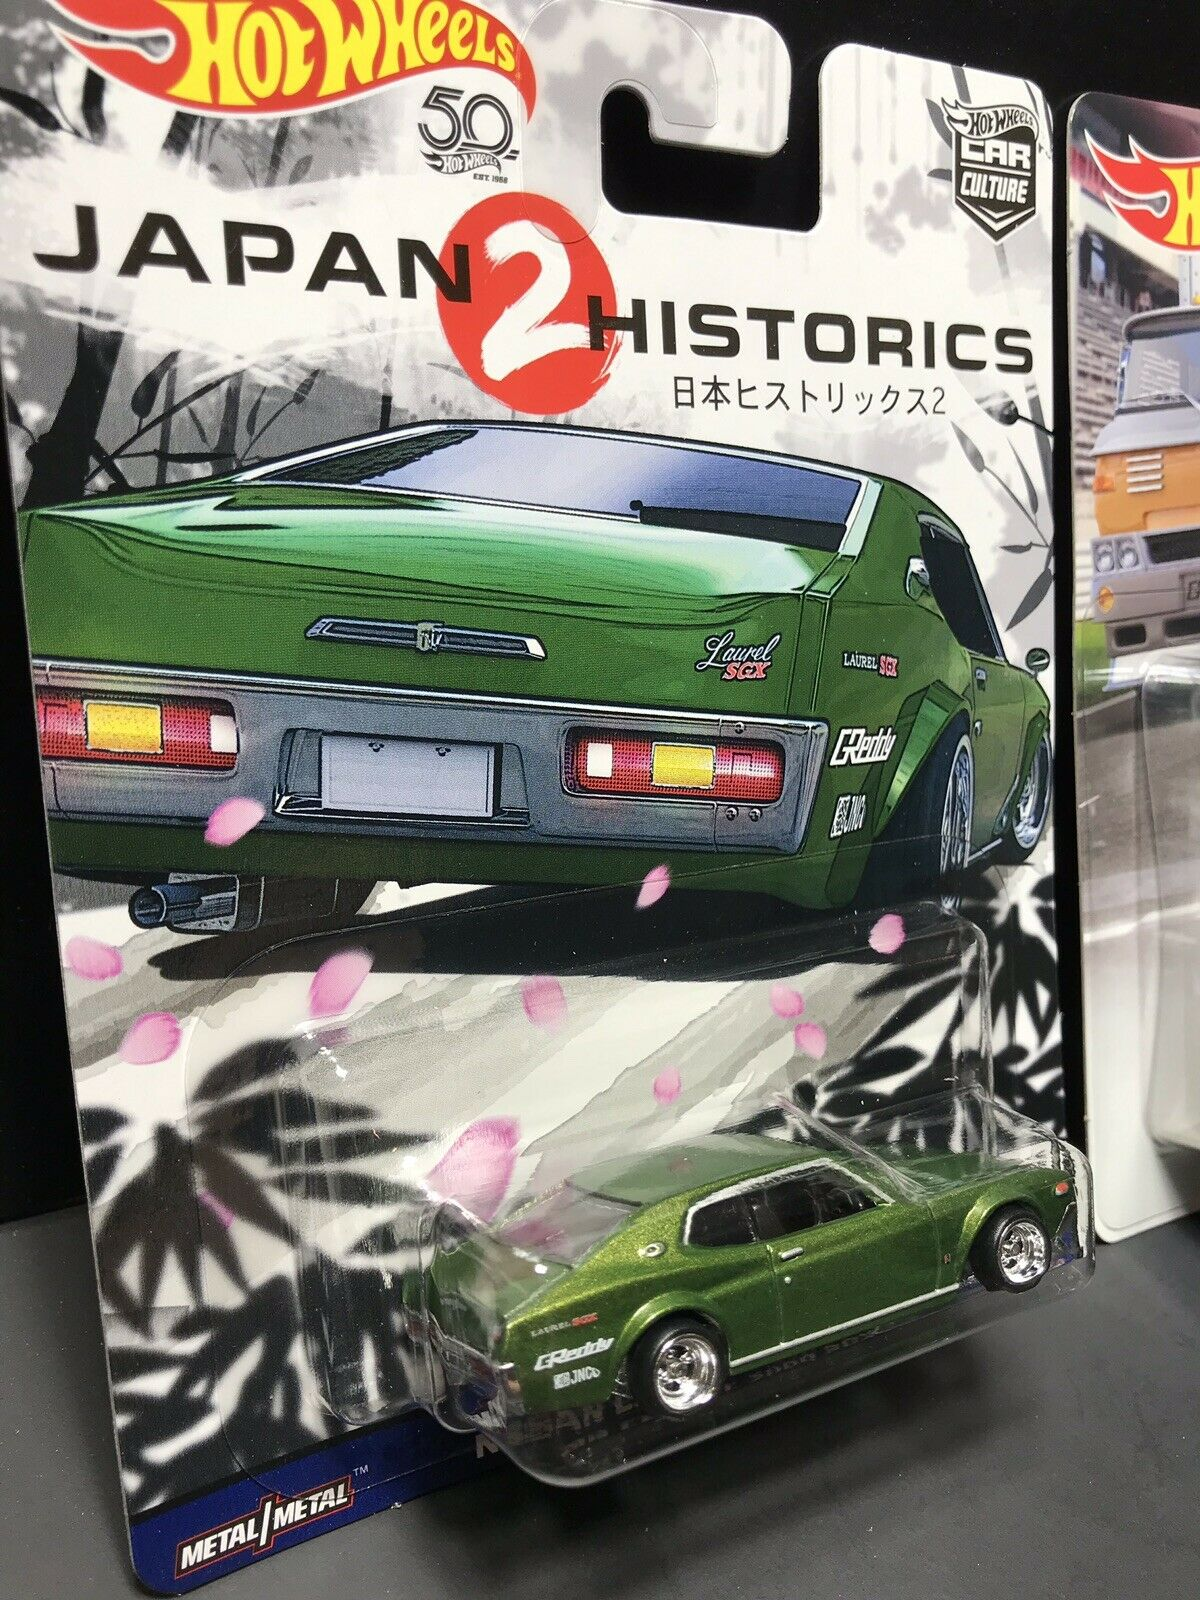 HOT WHEELS NISSAN LAUREL JAPAN HISTORICS GULF TEAM TRANSPORT TRANSPORT TRANSPORT BUNDLE LOT OF 3 3fe0d3